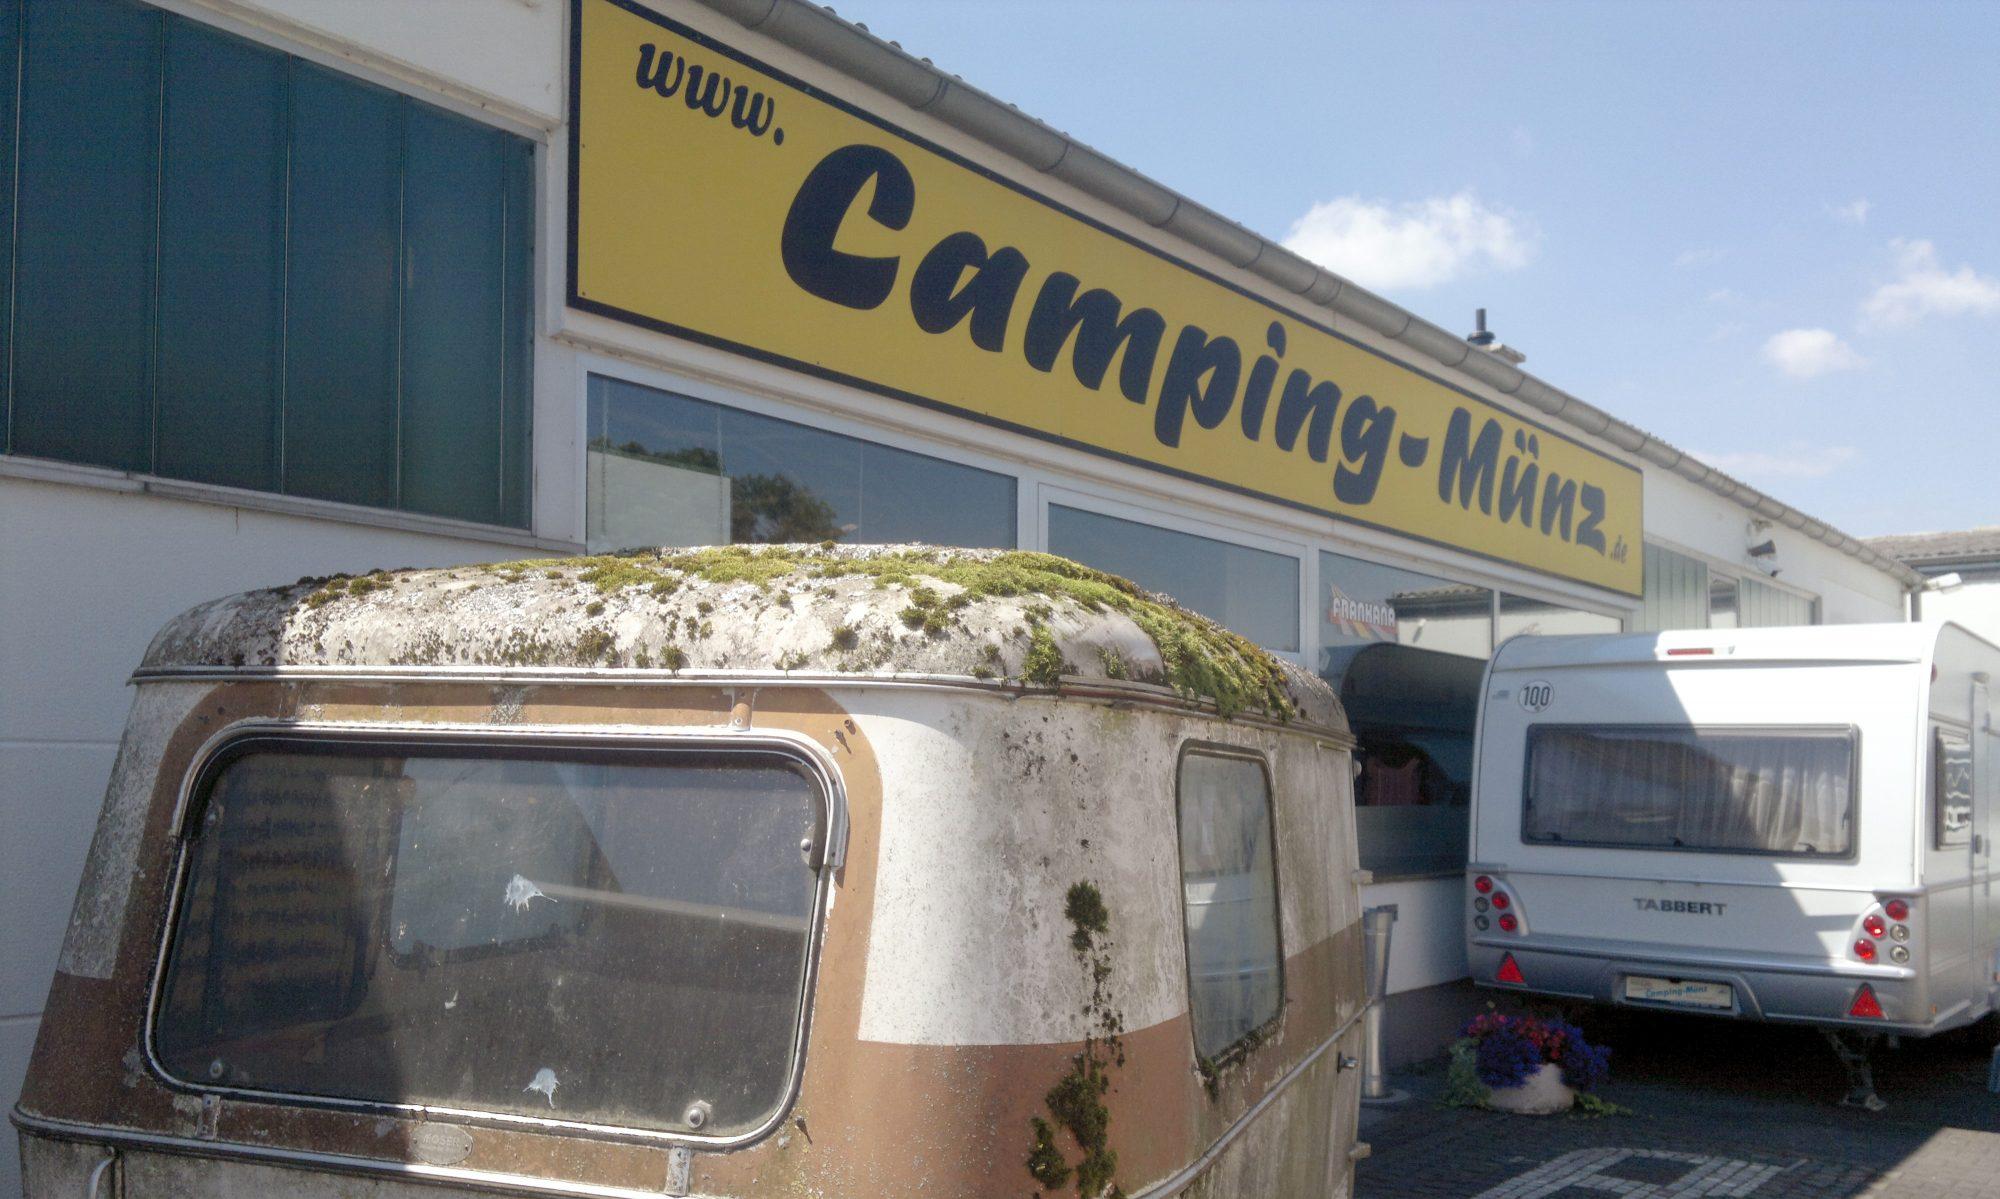 Wohnmobile Camping Münz Wohnwagen Wohnmobile